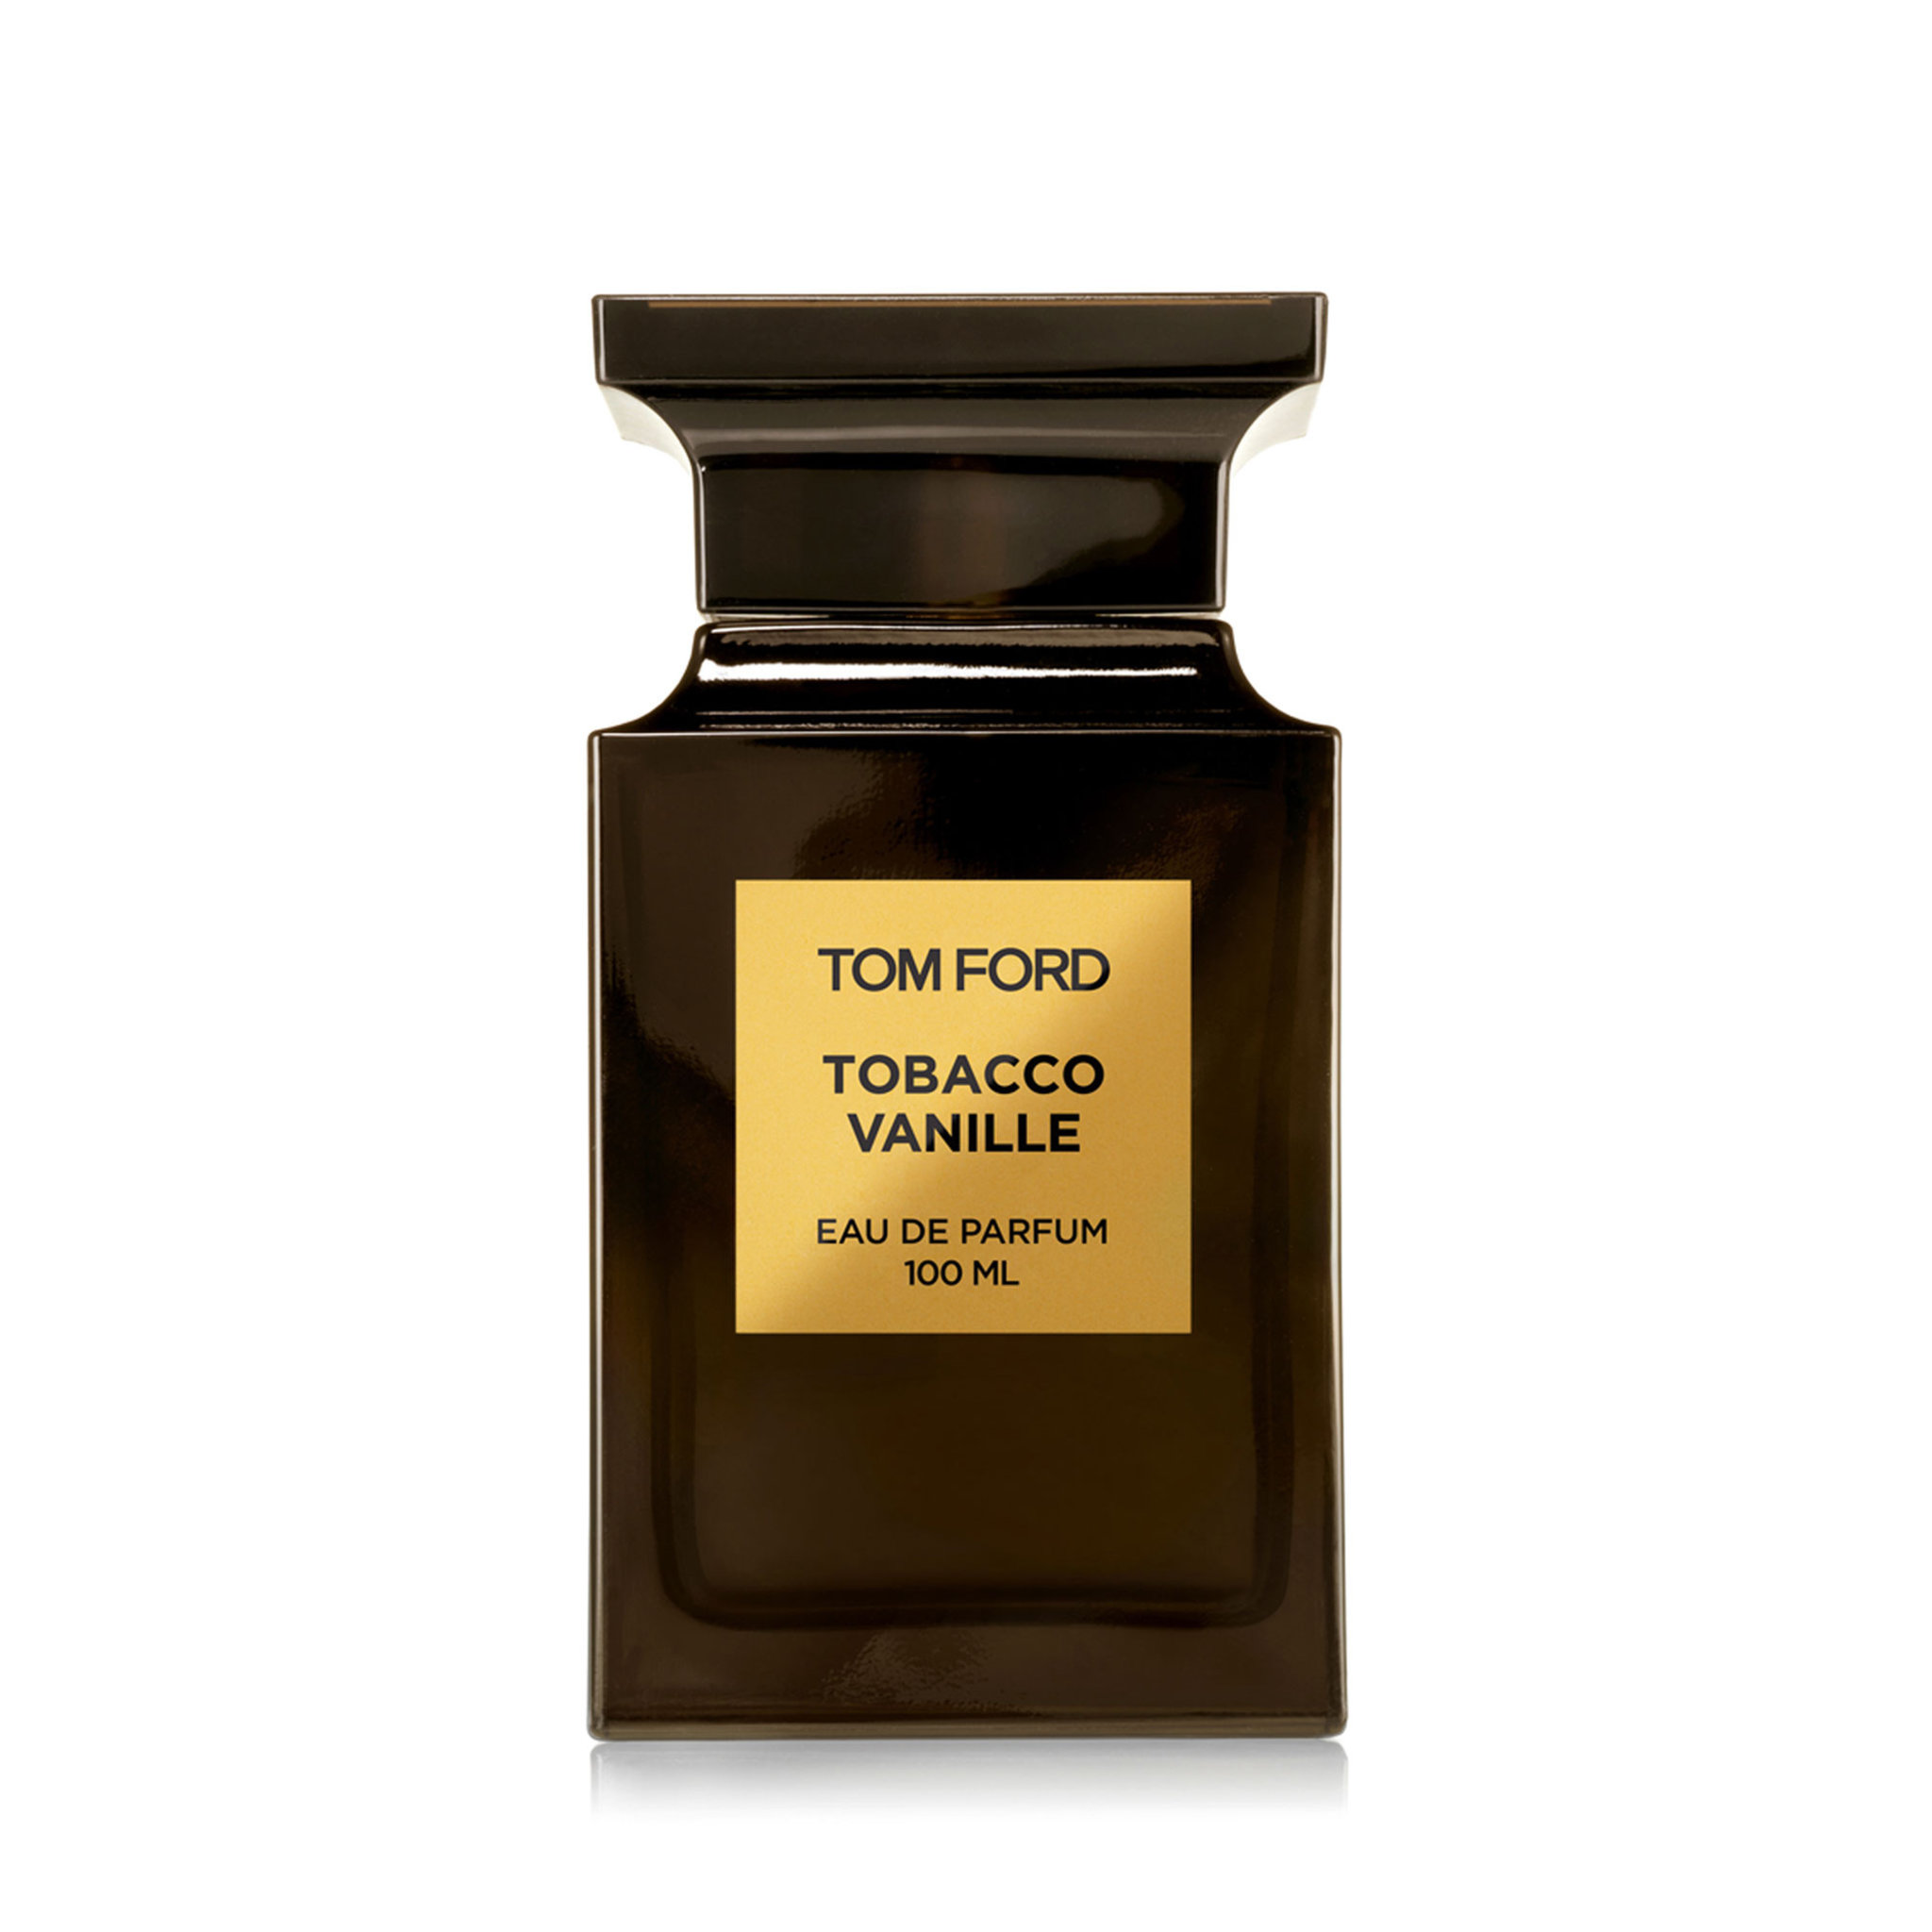 Tobacco Vanille EdP, 100 ml, 100 ML